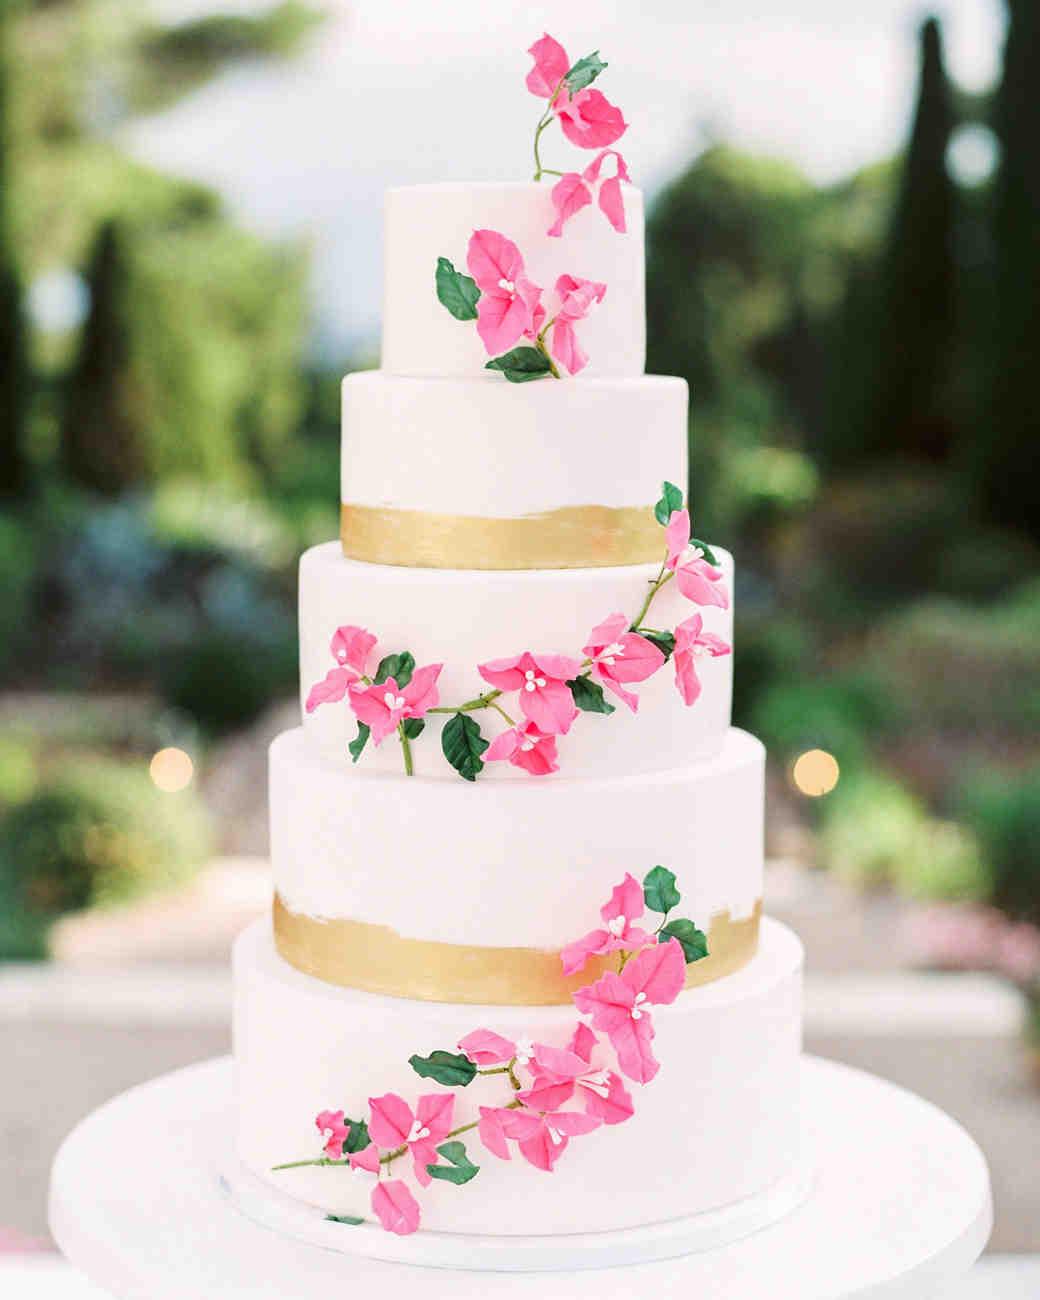 stephanie nikolaus wedding cake